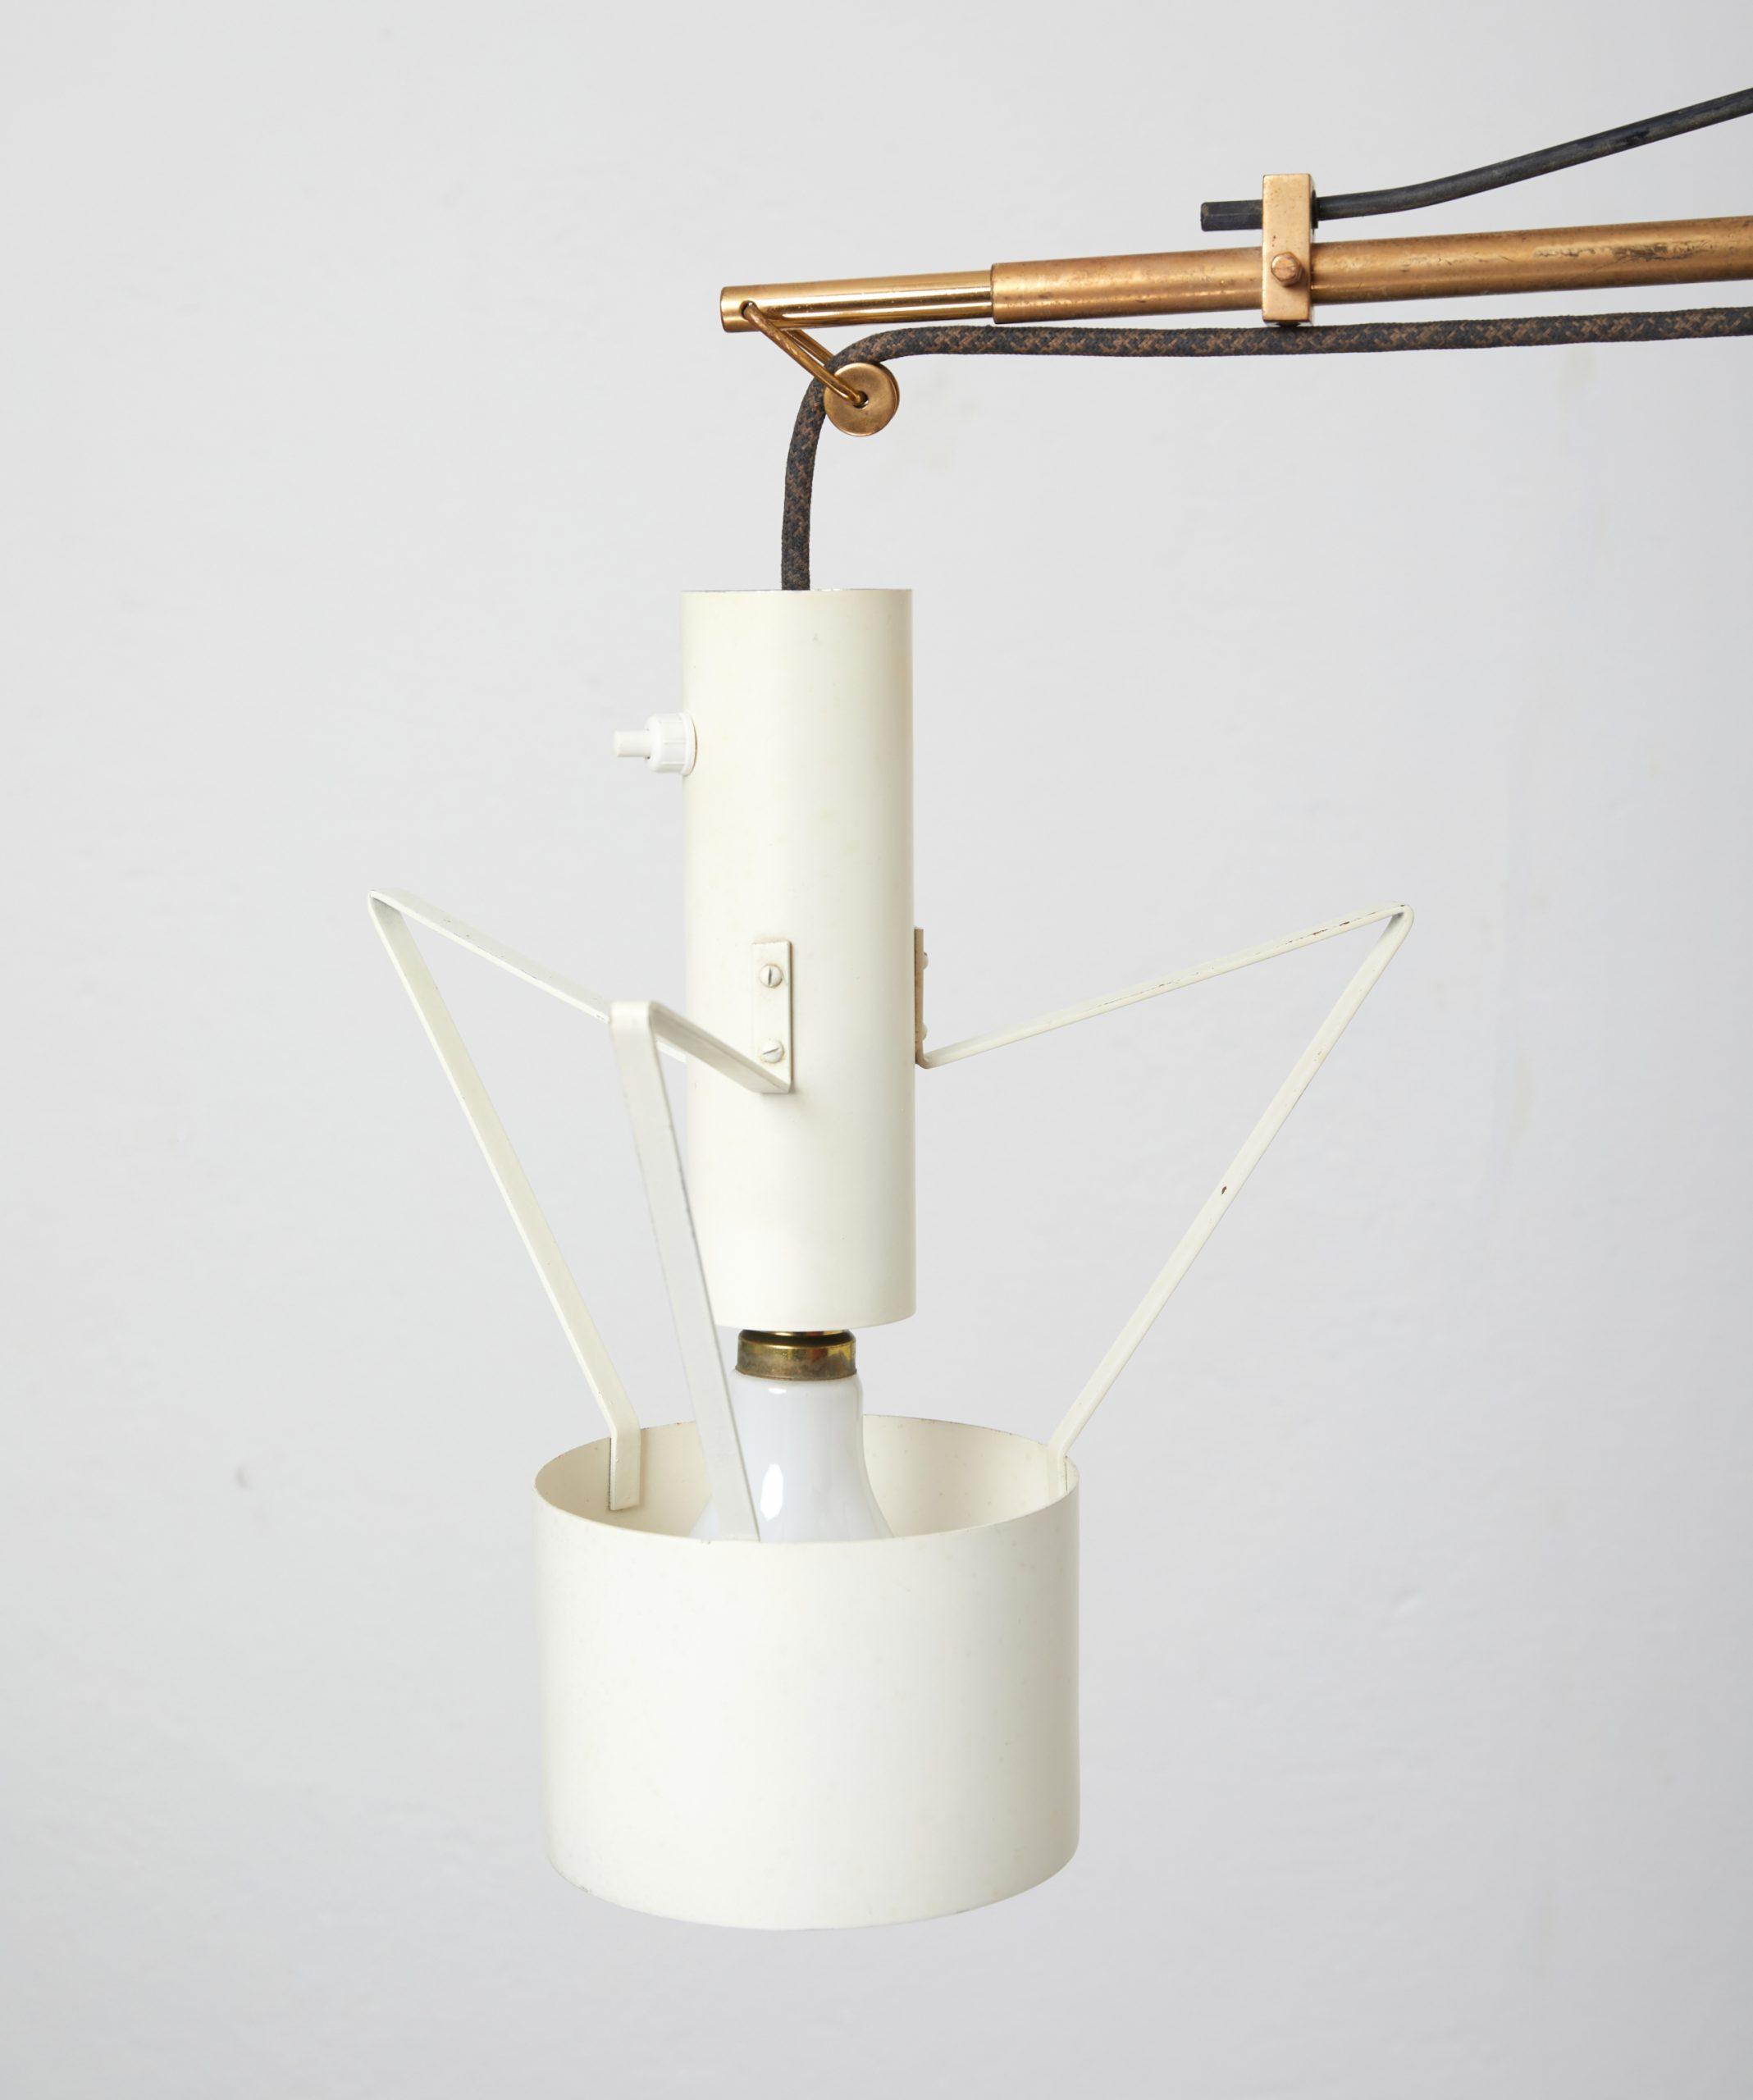 brass-wall-lamp-model-2061-by-gaetano-scolari-for-stilnovo-1954-image-15